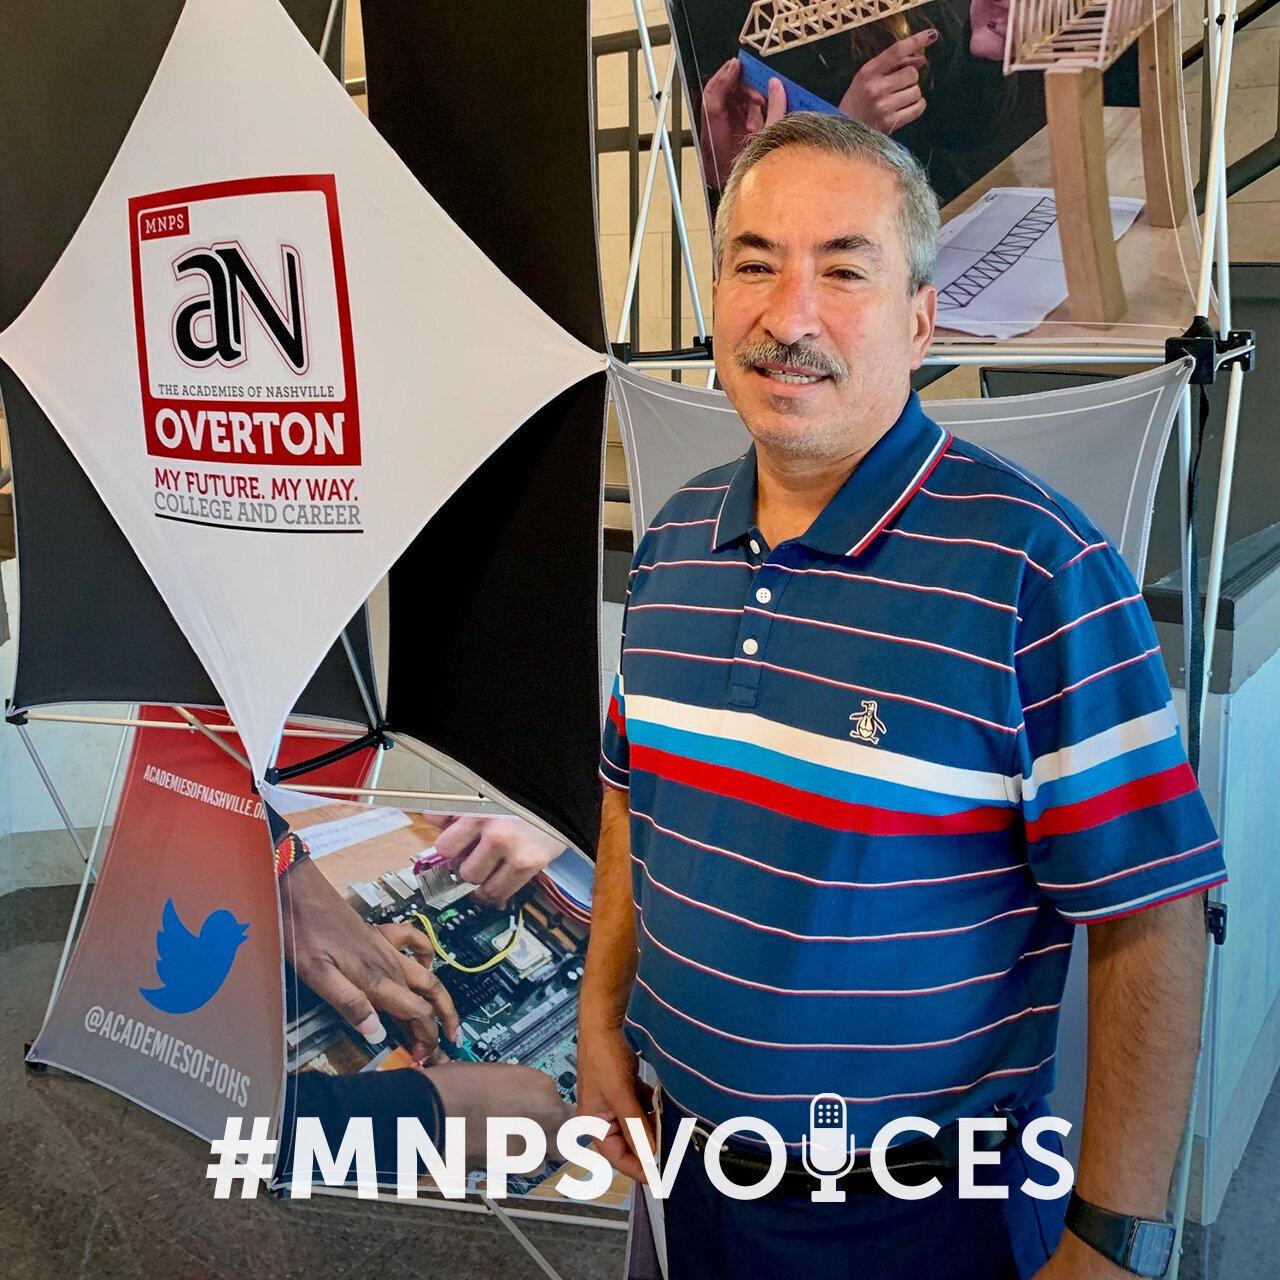 MNPSVoices_091819_JoseFlores.jpg